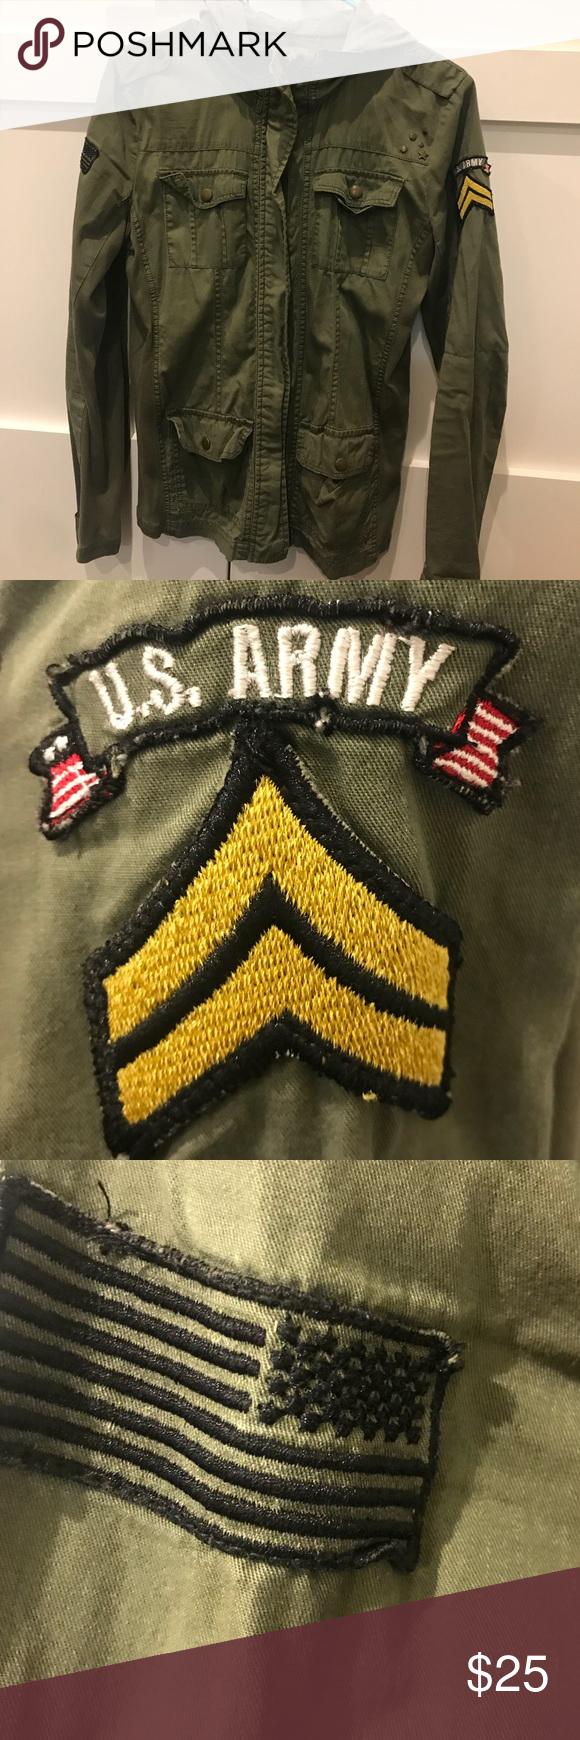 Hunter green army jacket